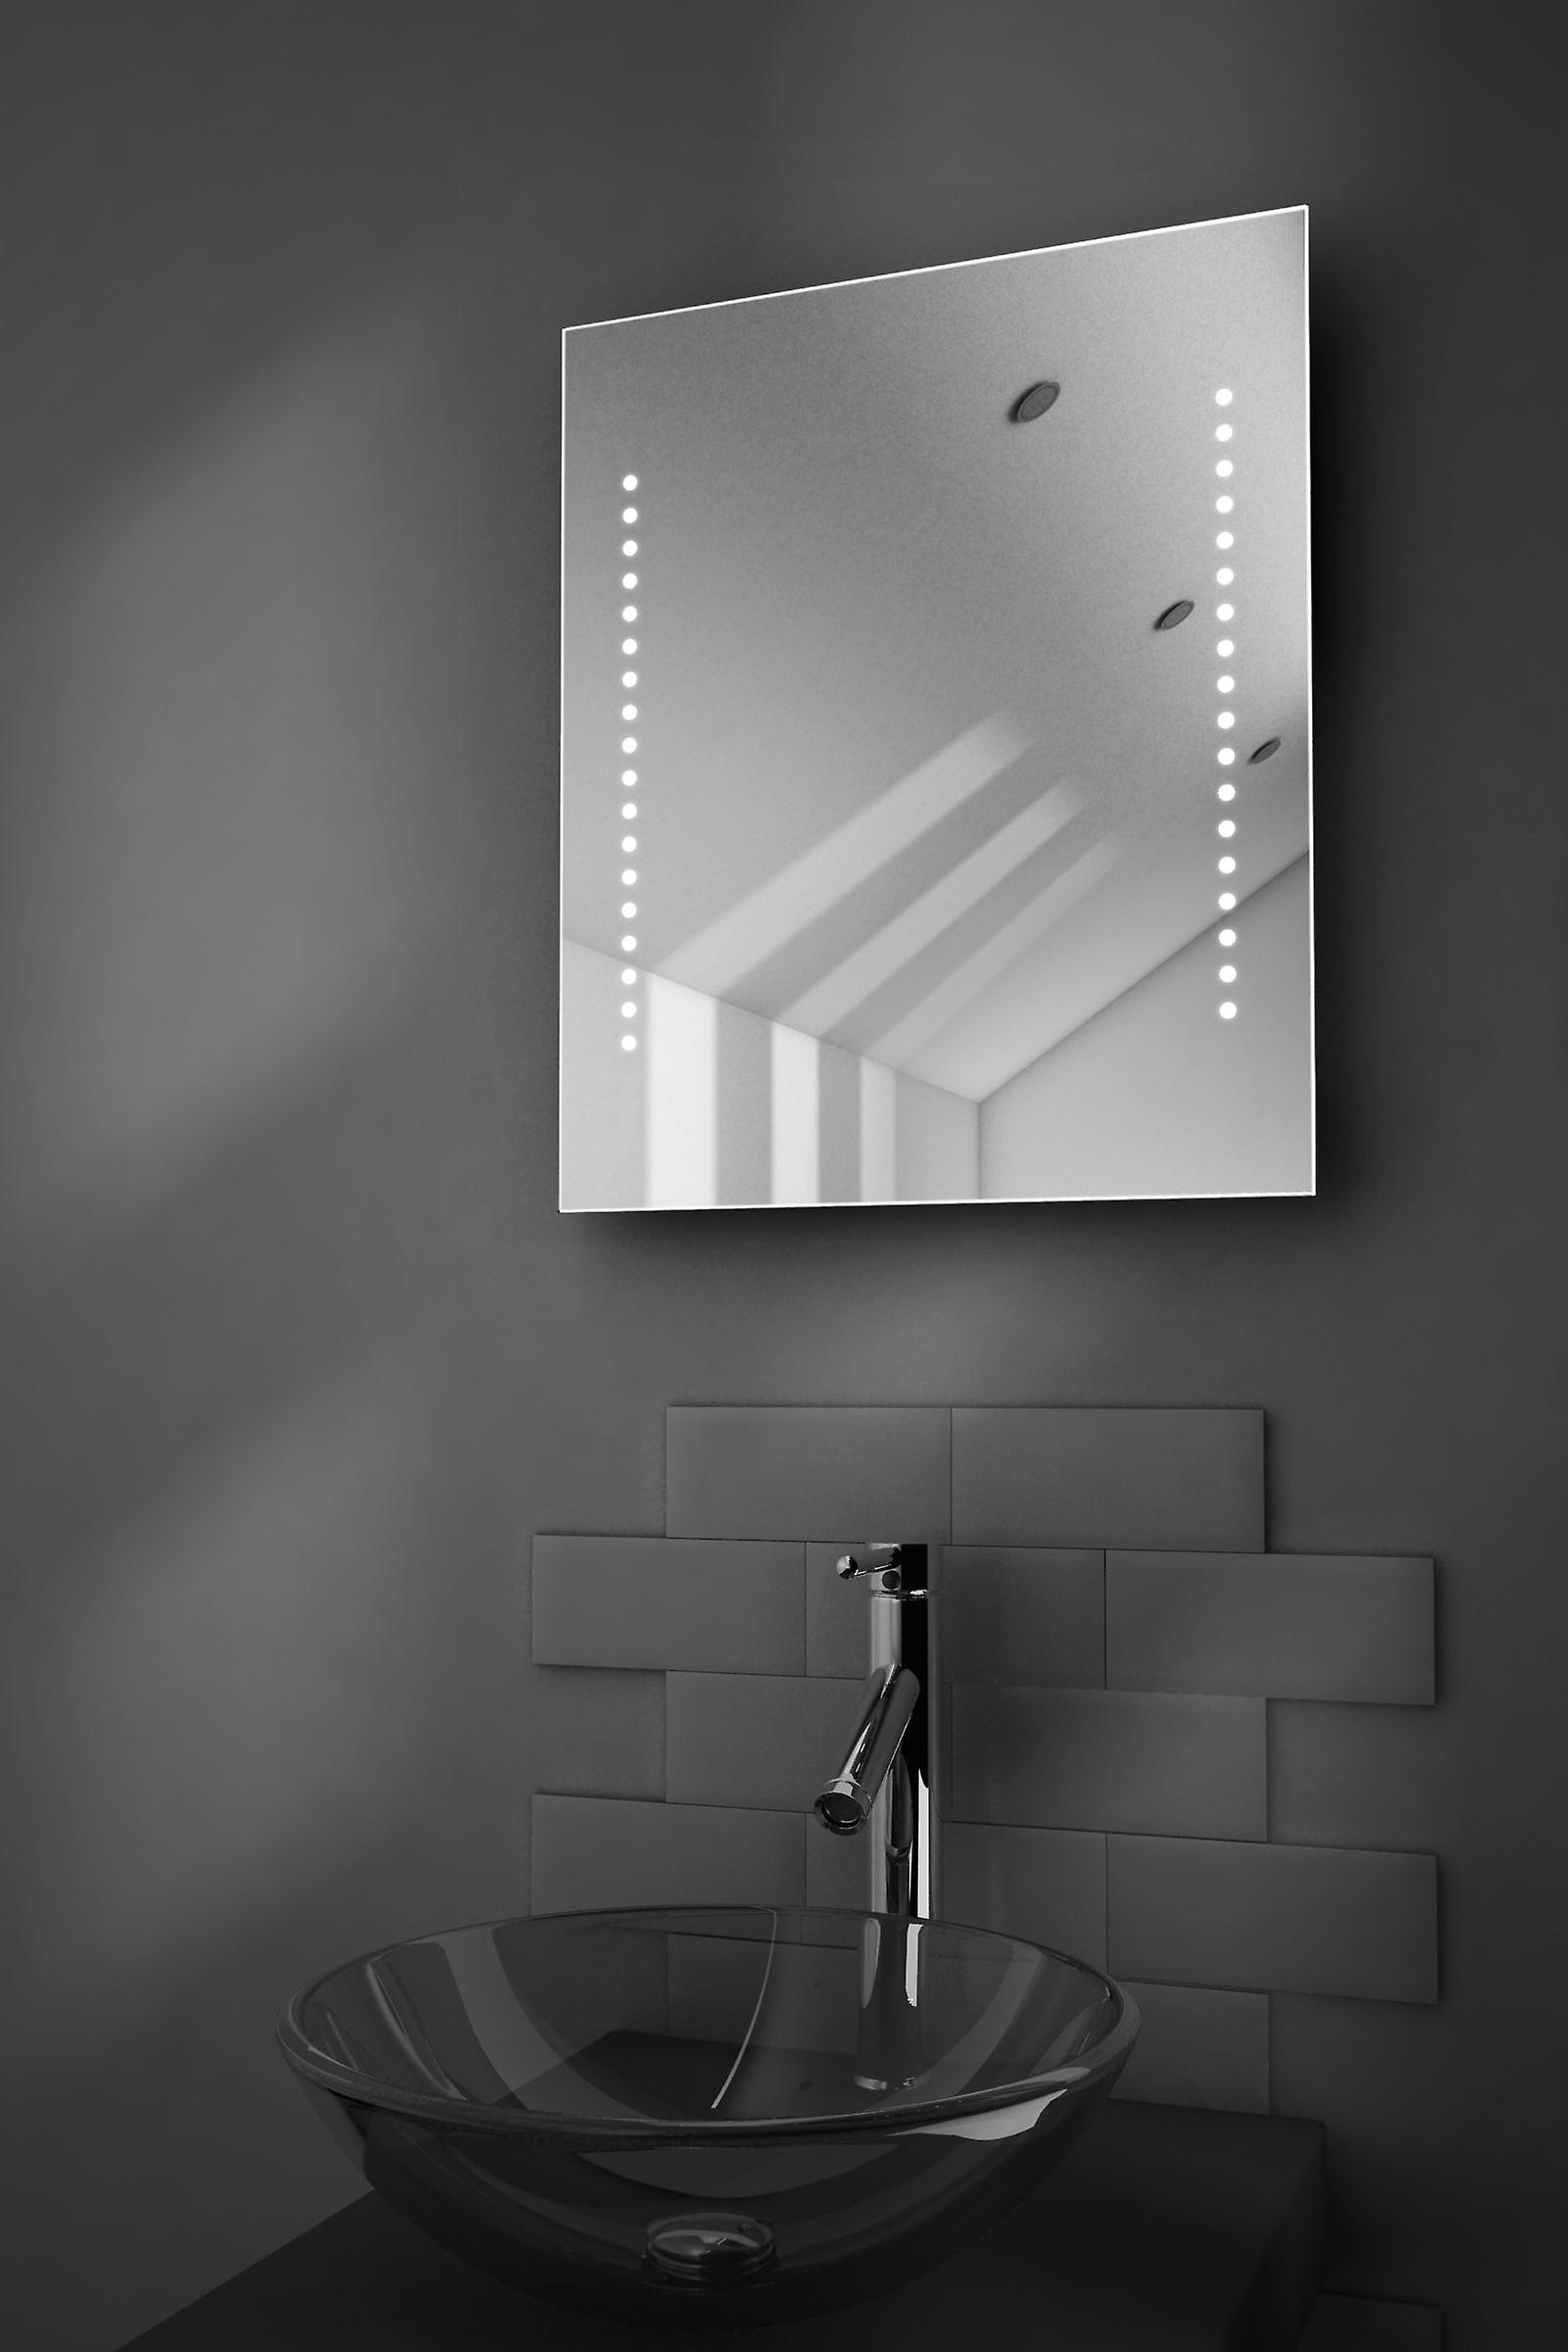 Dream Ultra-Slim LED Bathroom Mirror With Demister Pad & Sensor k55